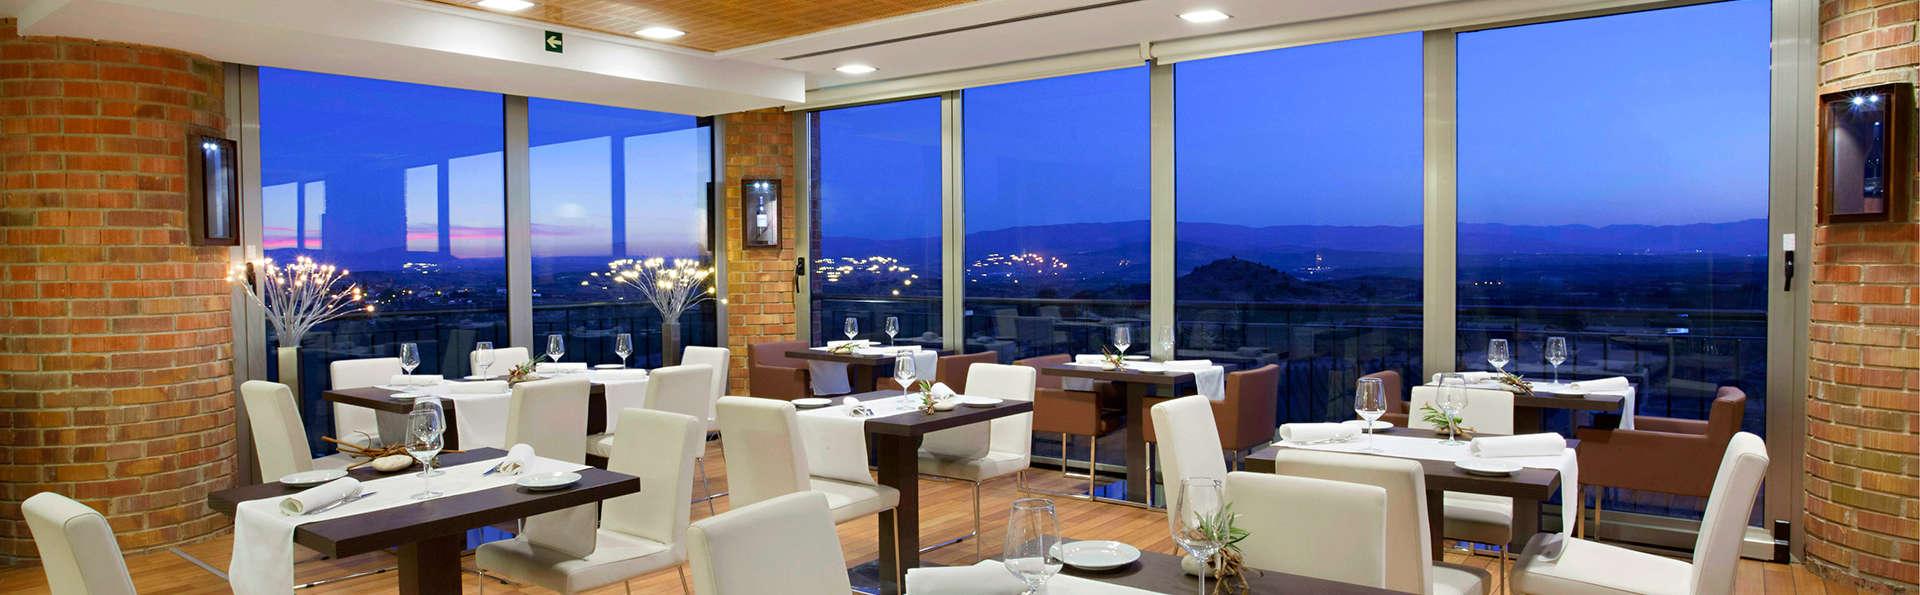 Hotel Eguren Ugarte - EDIT_restaurant.jpg